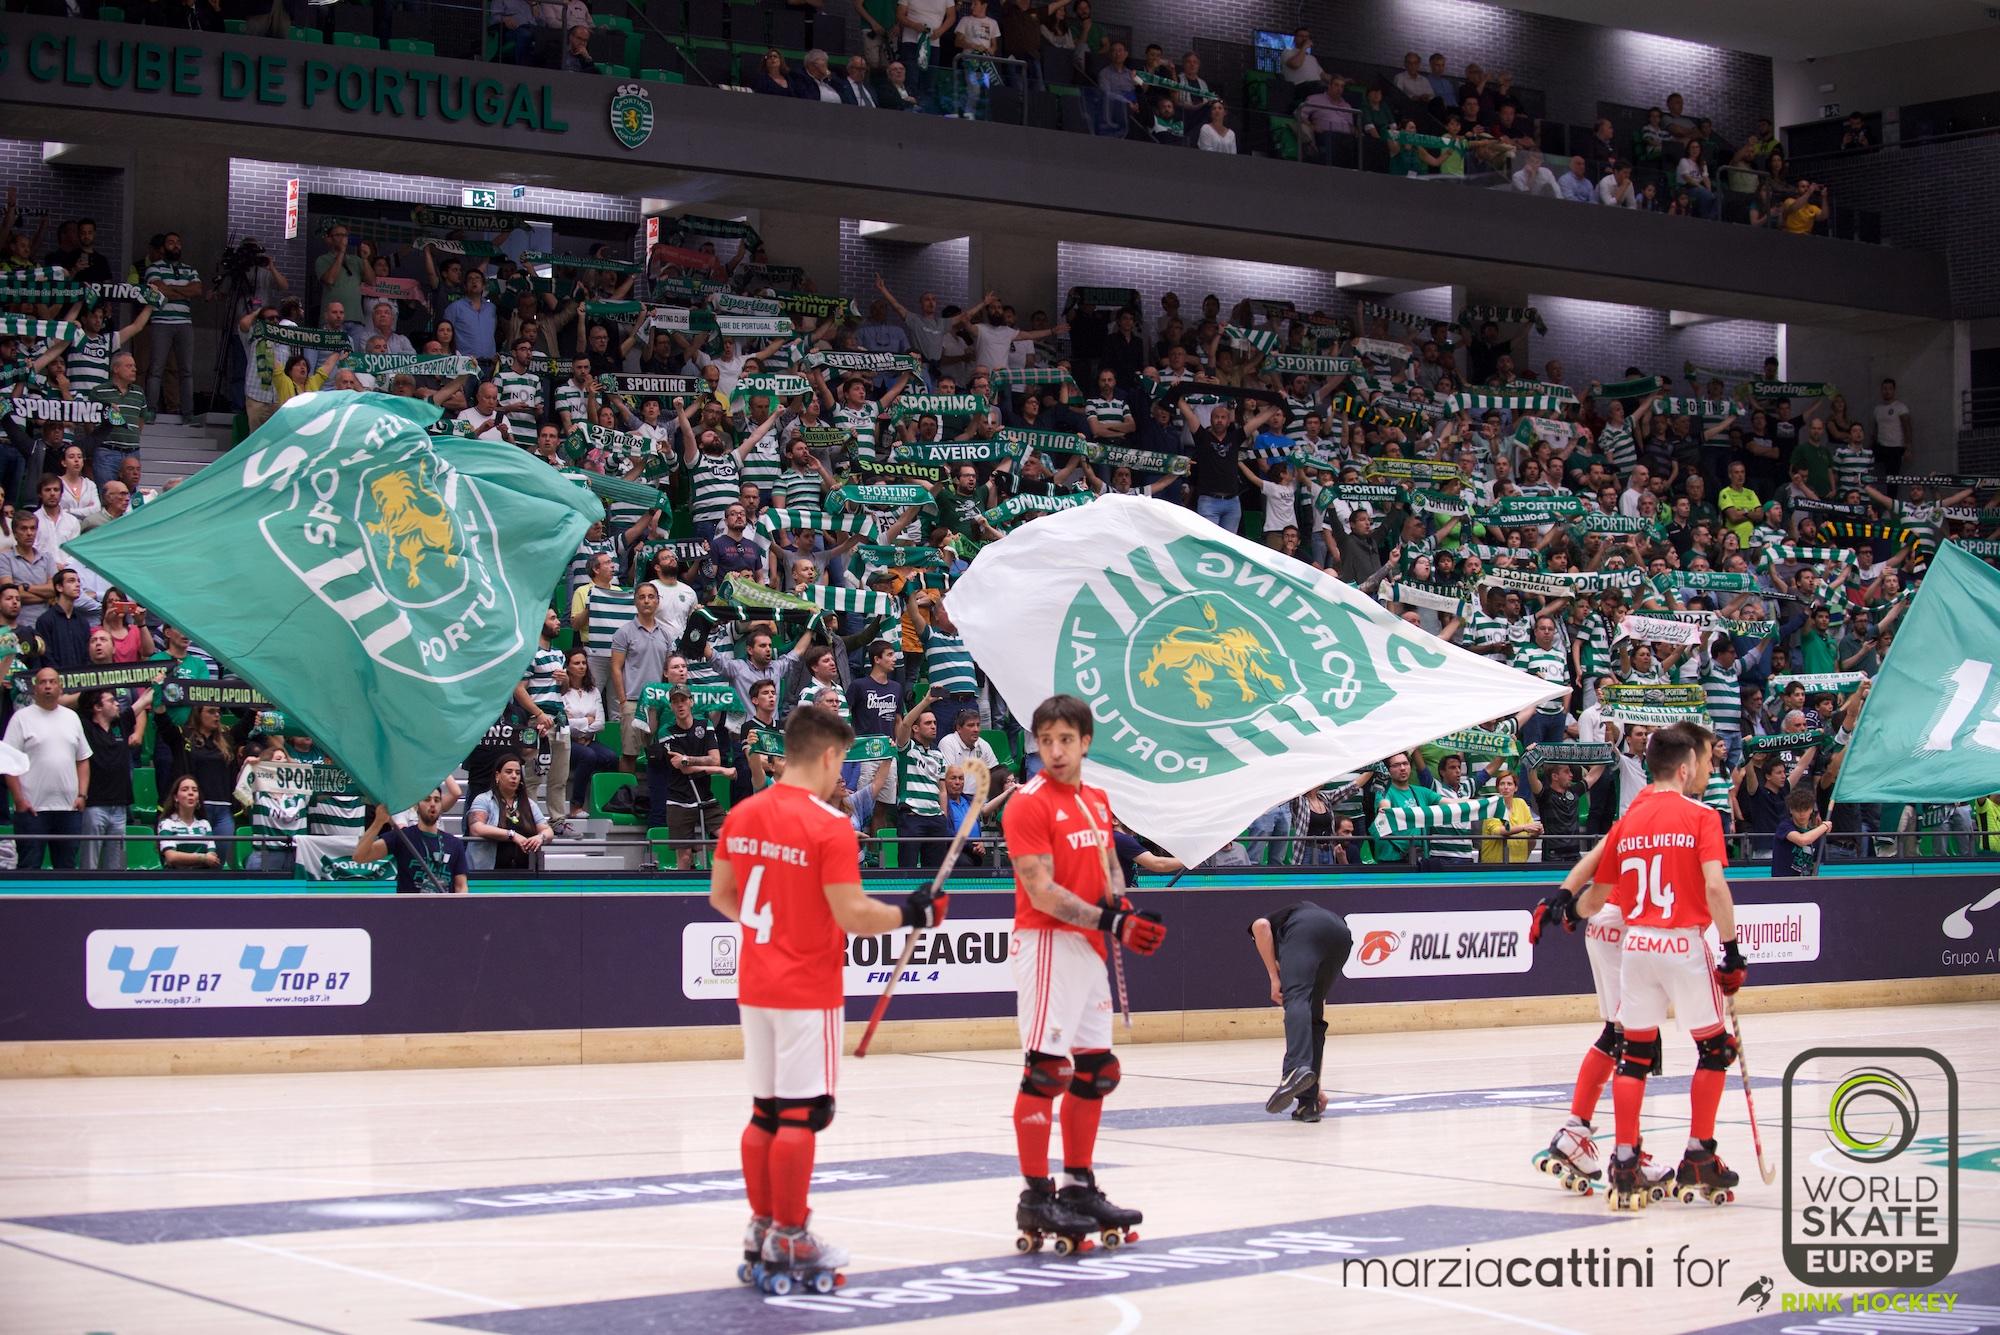 MarziaCattini19-05-11-Sporting-Benfica20